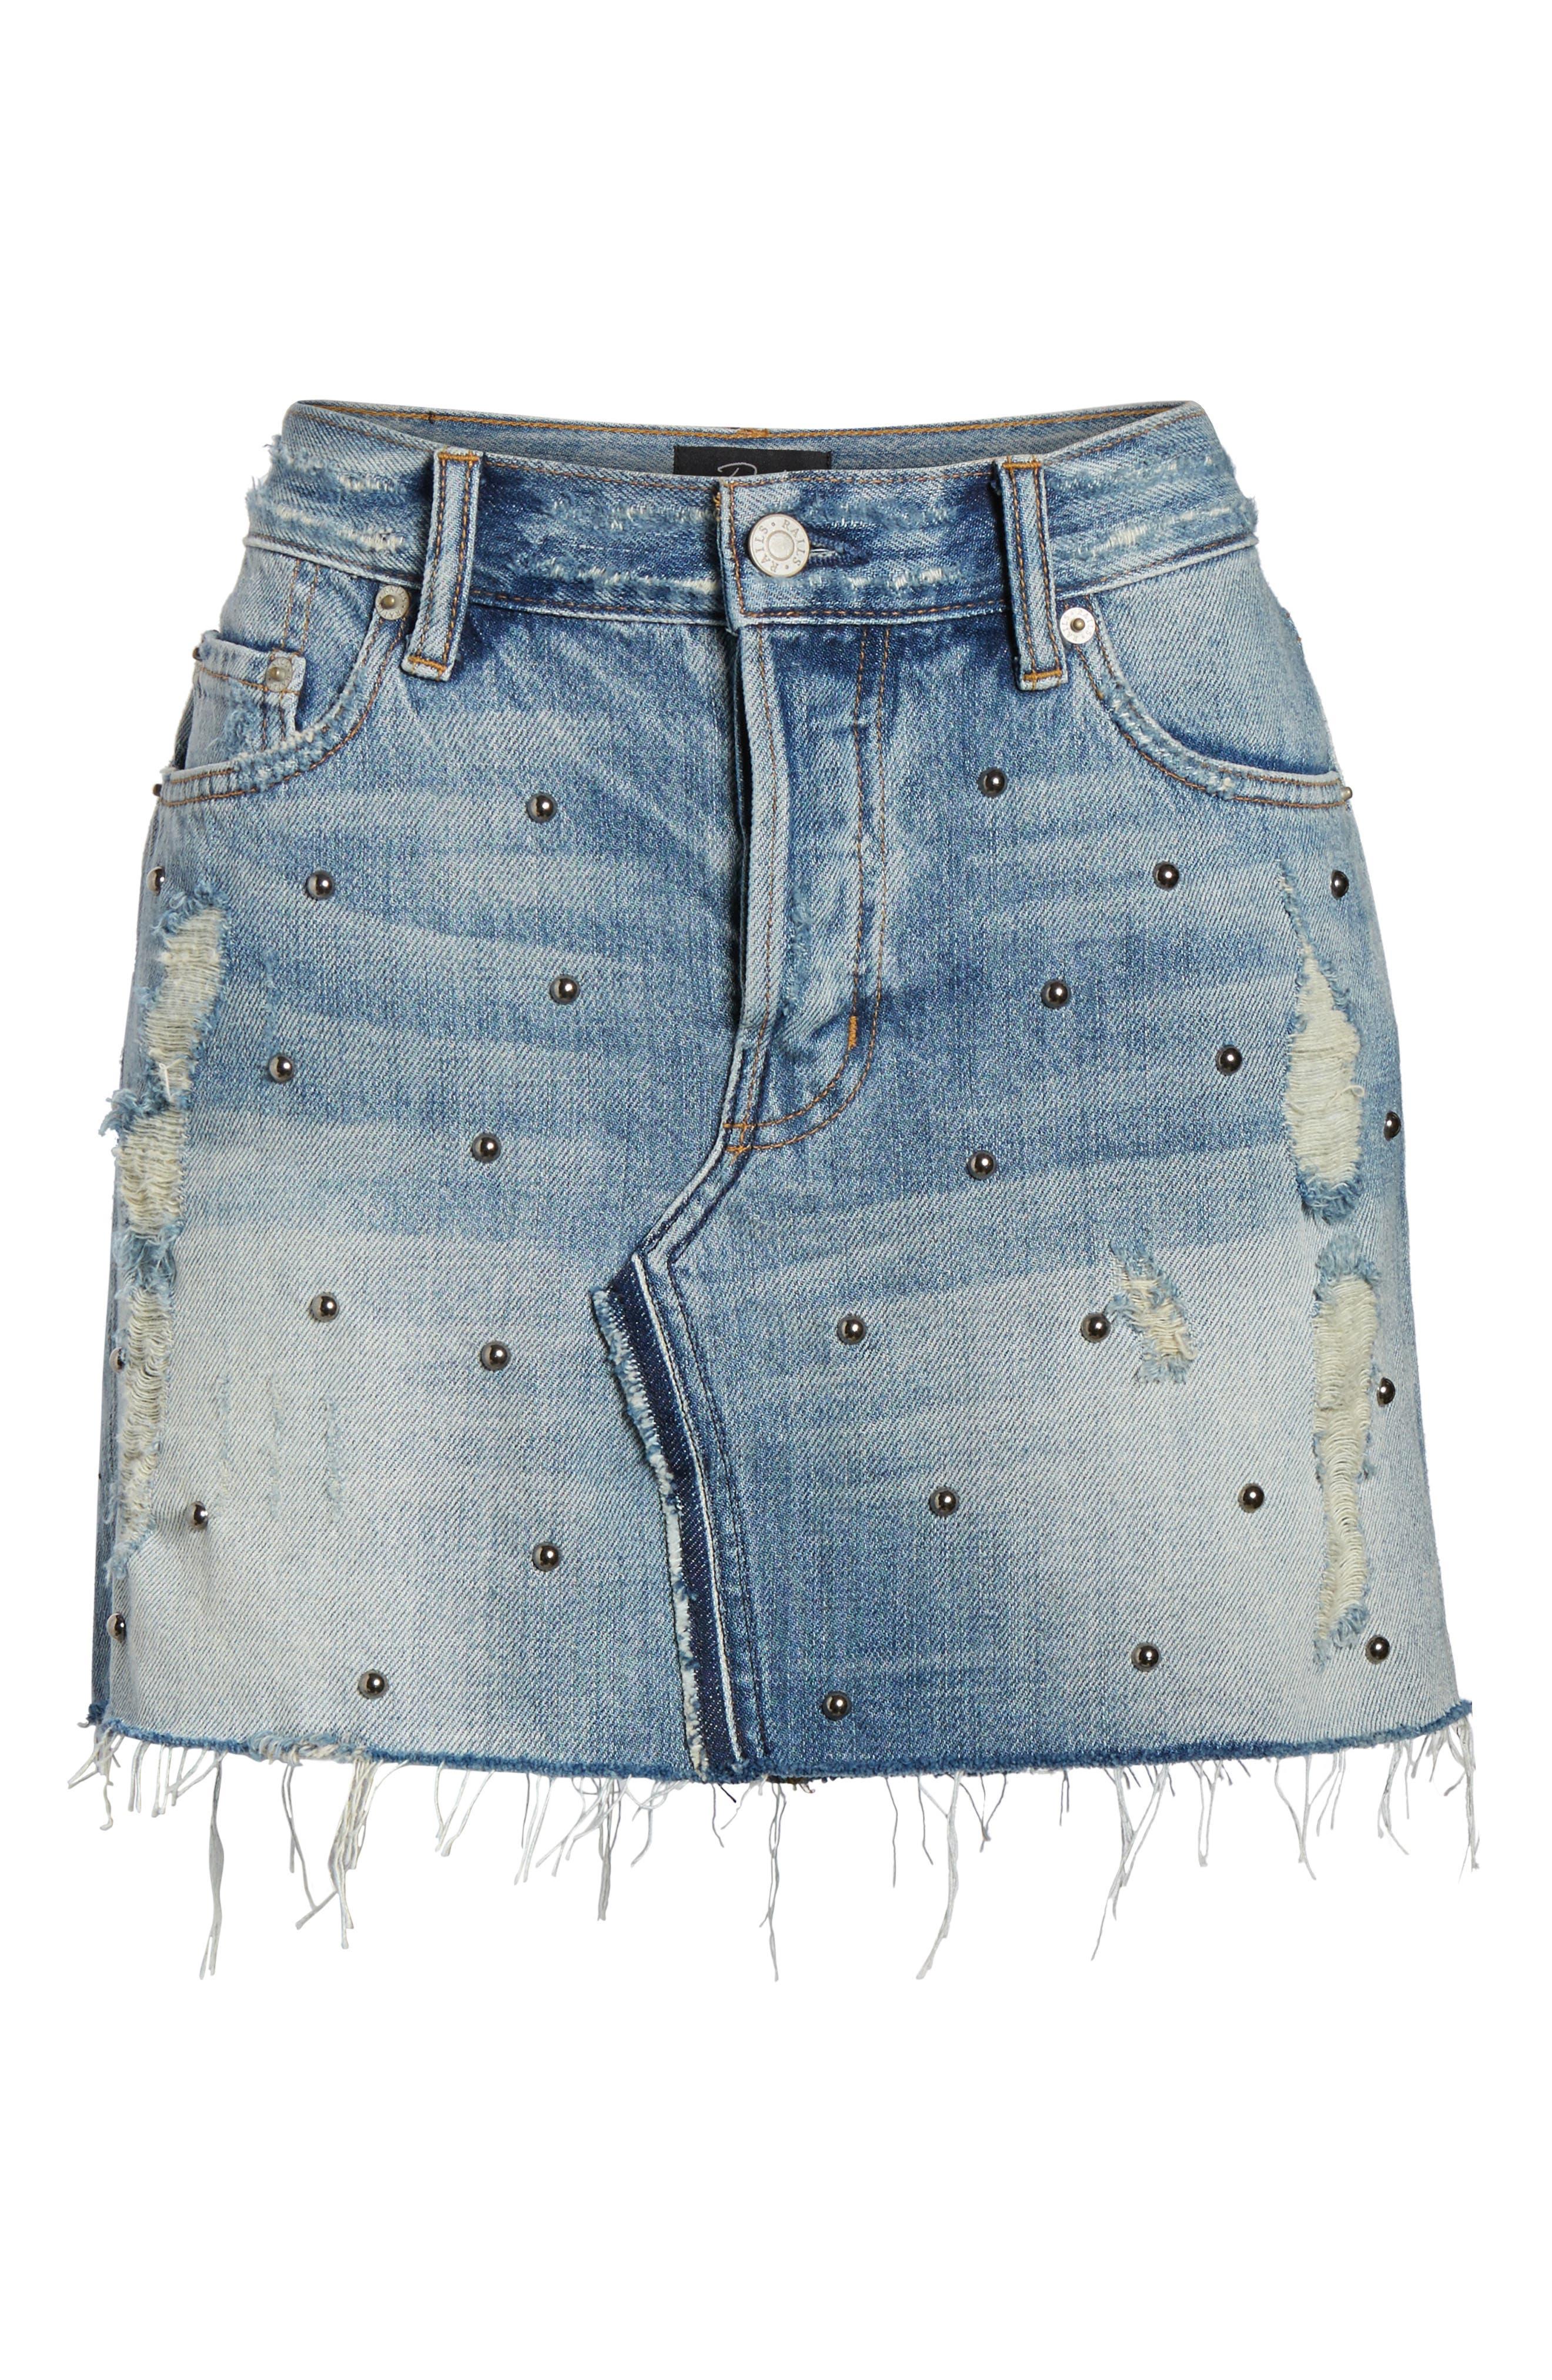 Wynonna Studded Cutoff Denim Miniskirt,                             Alternate thumbnail 7, color,                             MED VINTAGE ALL OVER STUDDED